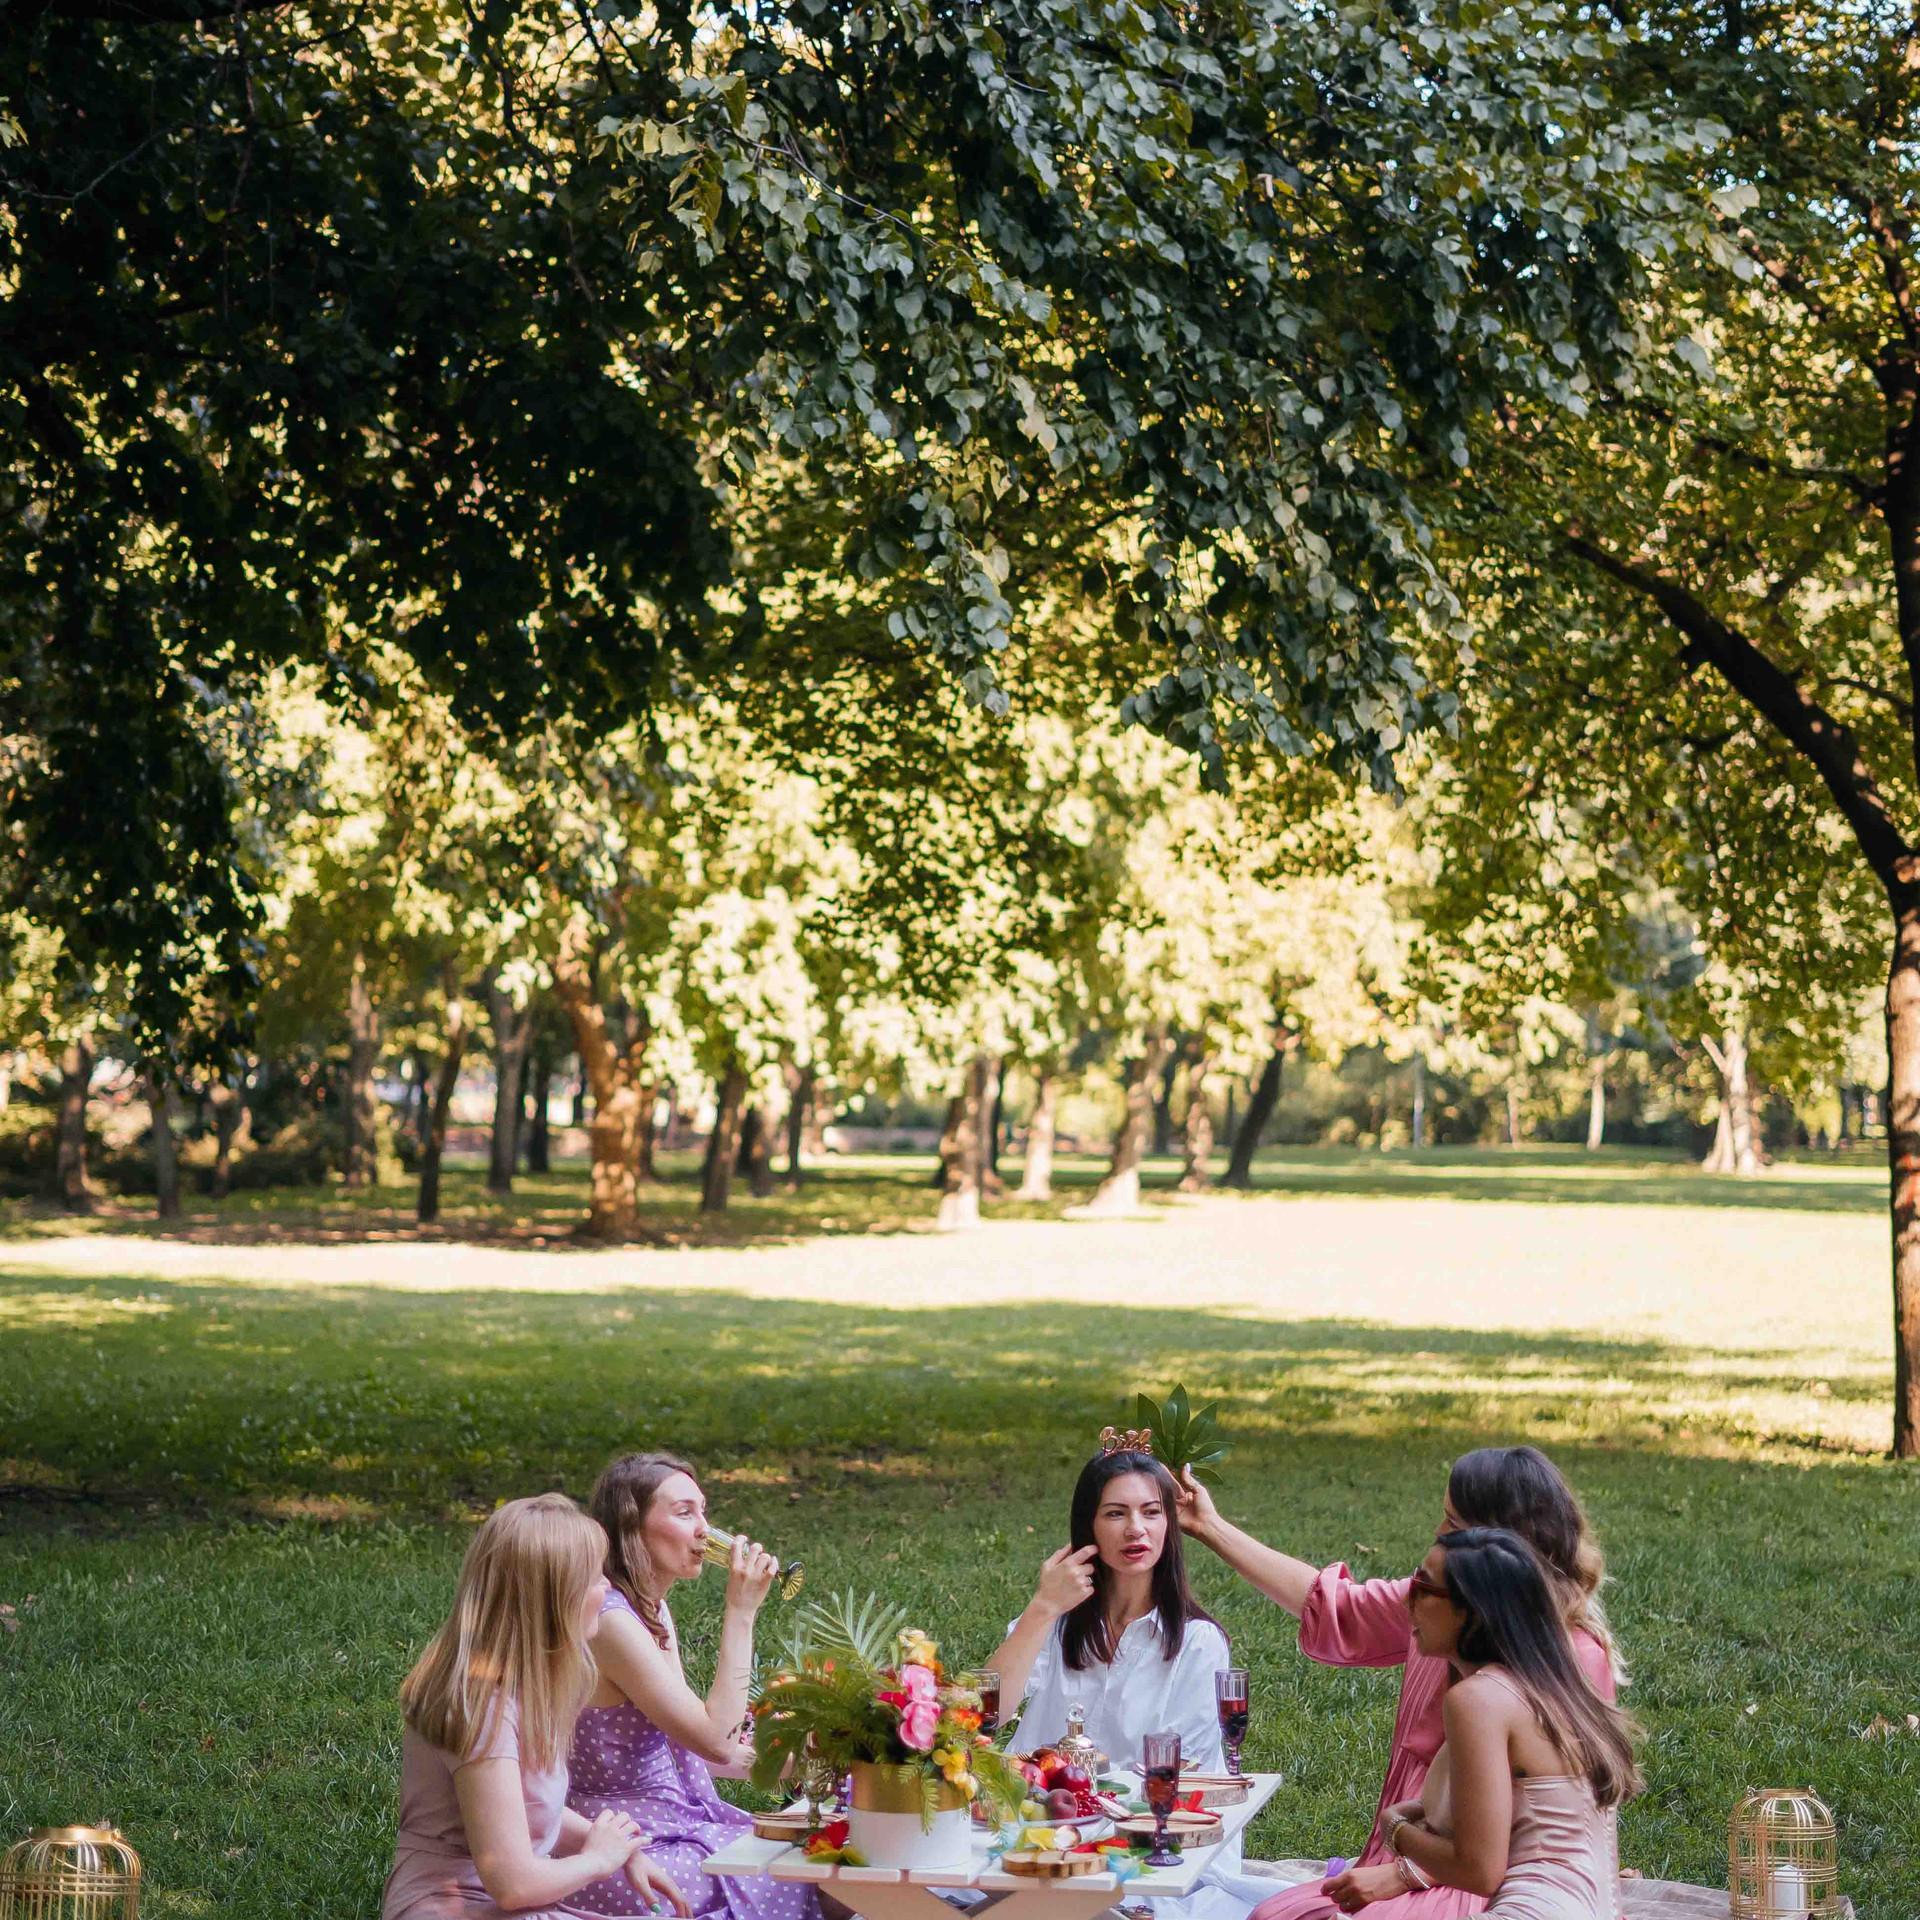 bachelorette-party-in-budapest-11.jpg